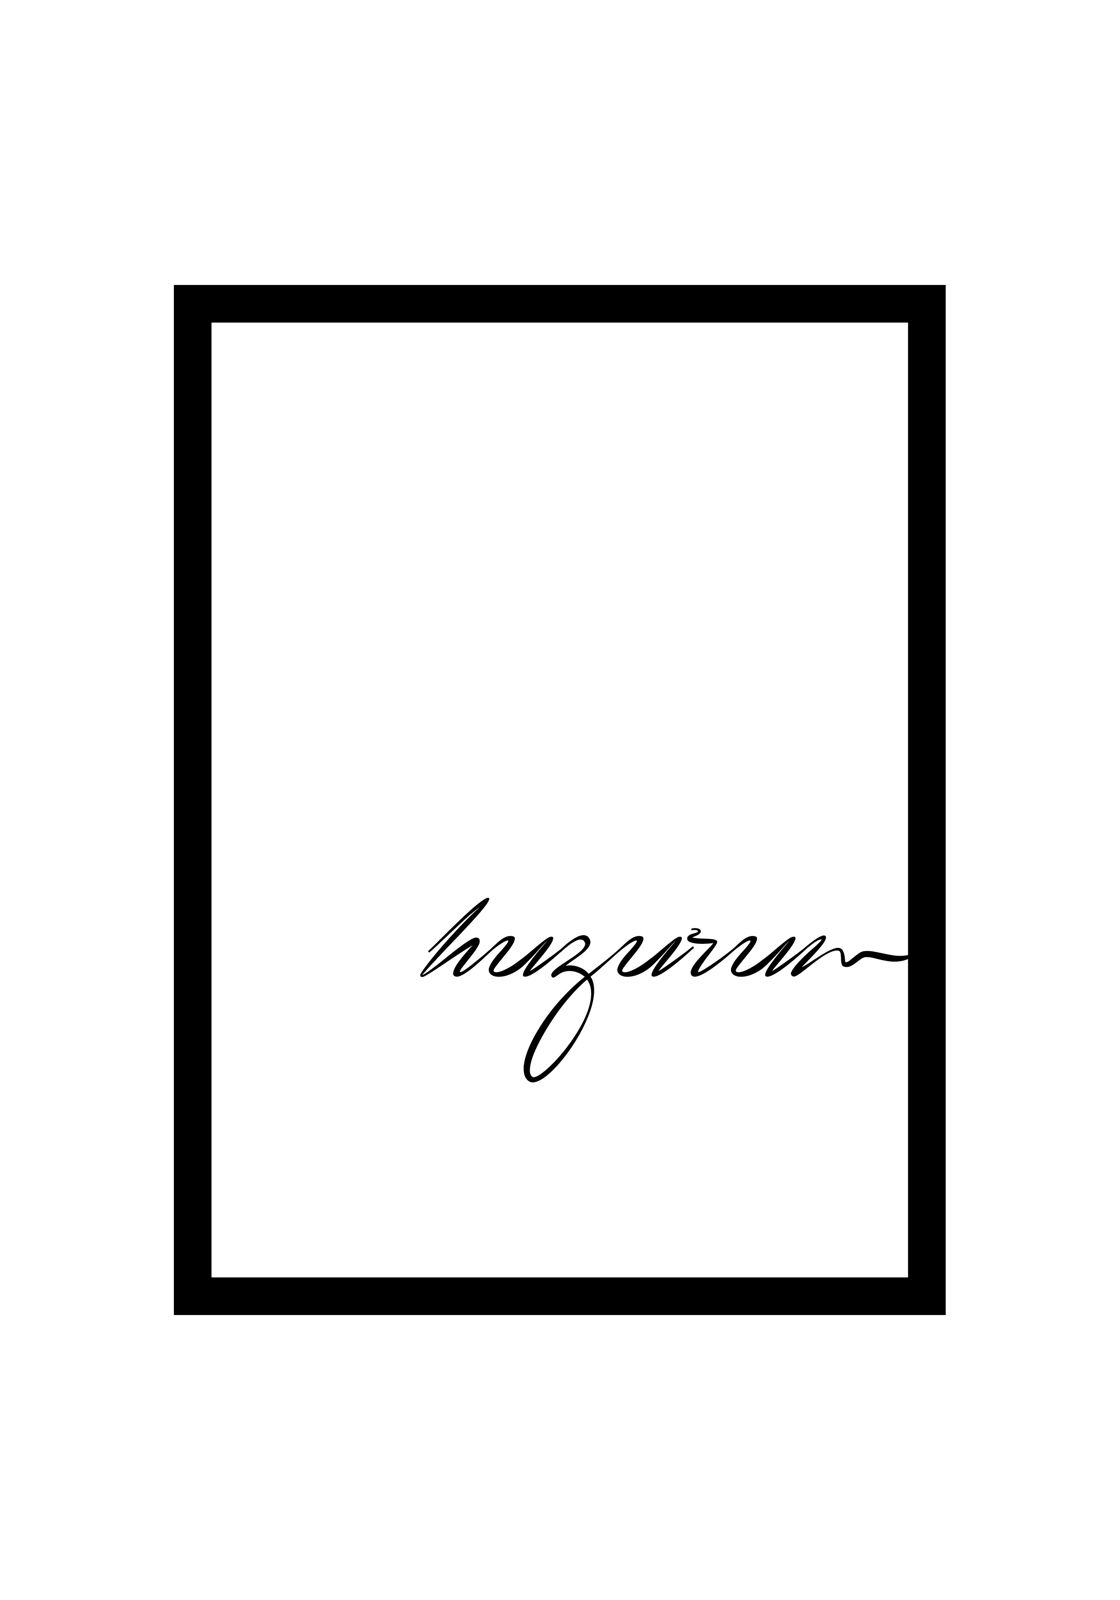 huzurum_opt